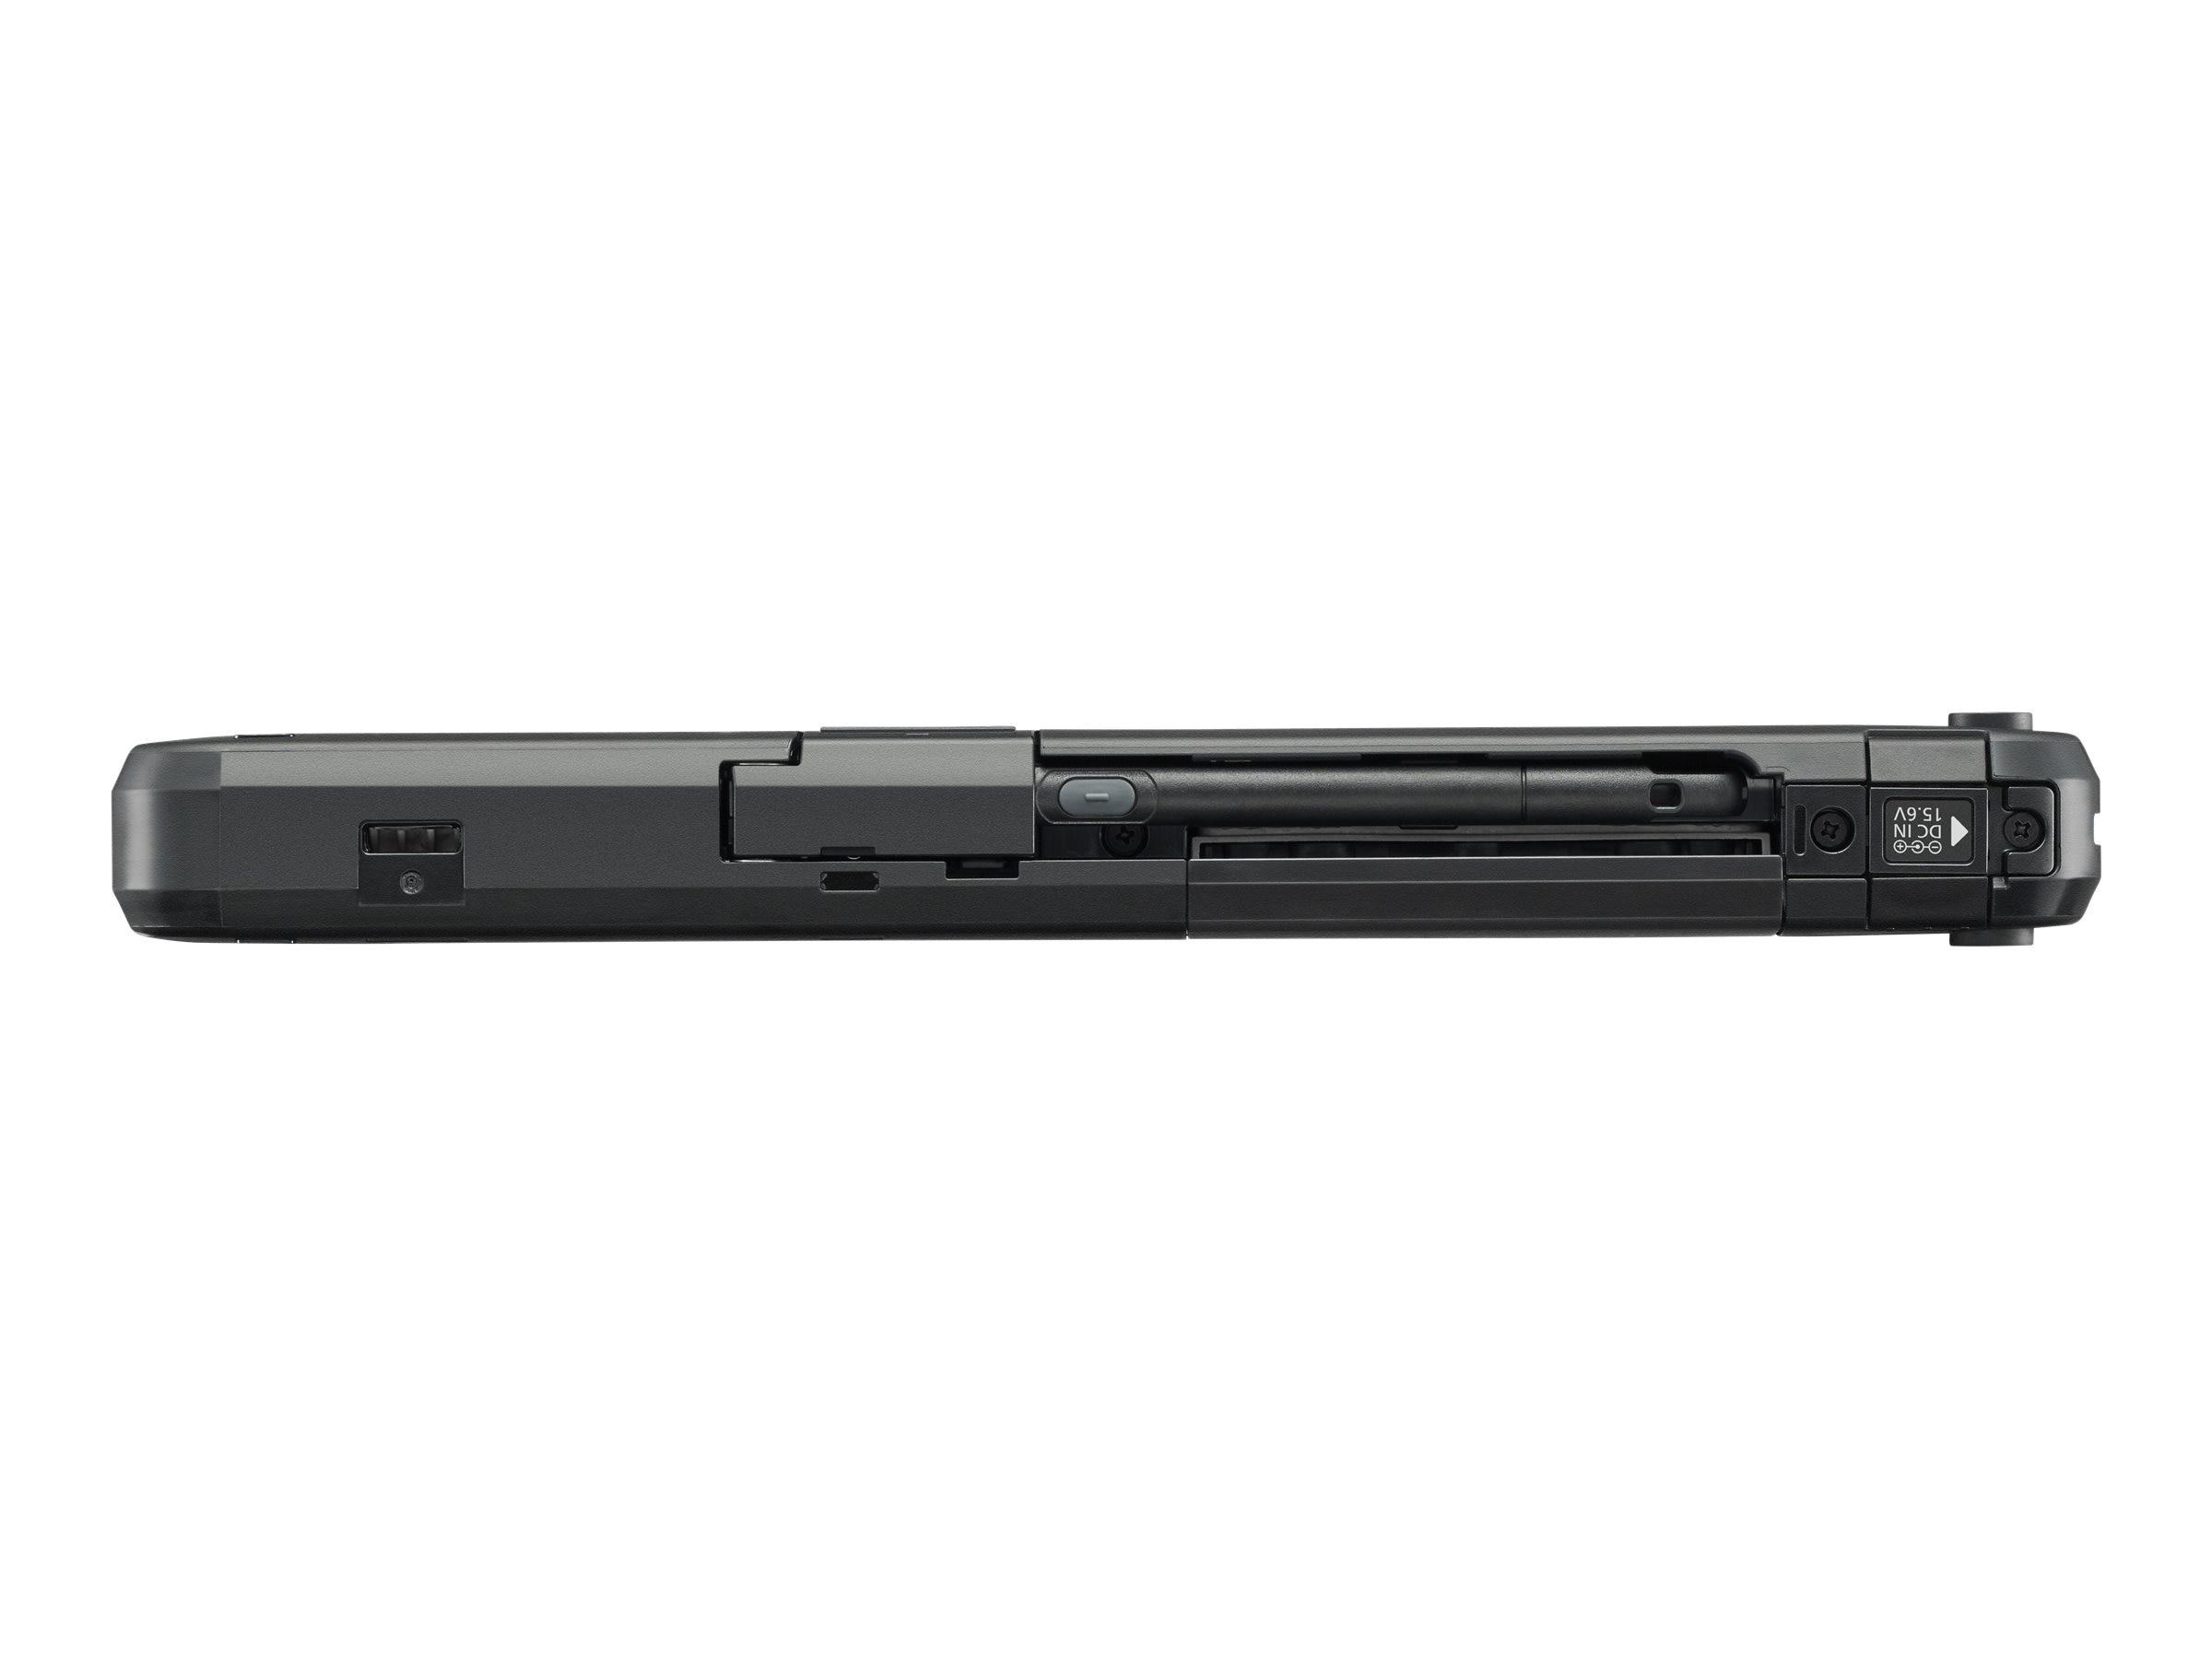 Panasonic Toughbook 33 Core i5-7300U 2 6GHz 8GB 256GB SSD ac BT LTE GPS Pen  KYB 2xWC 12